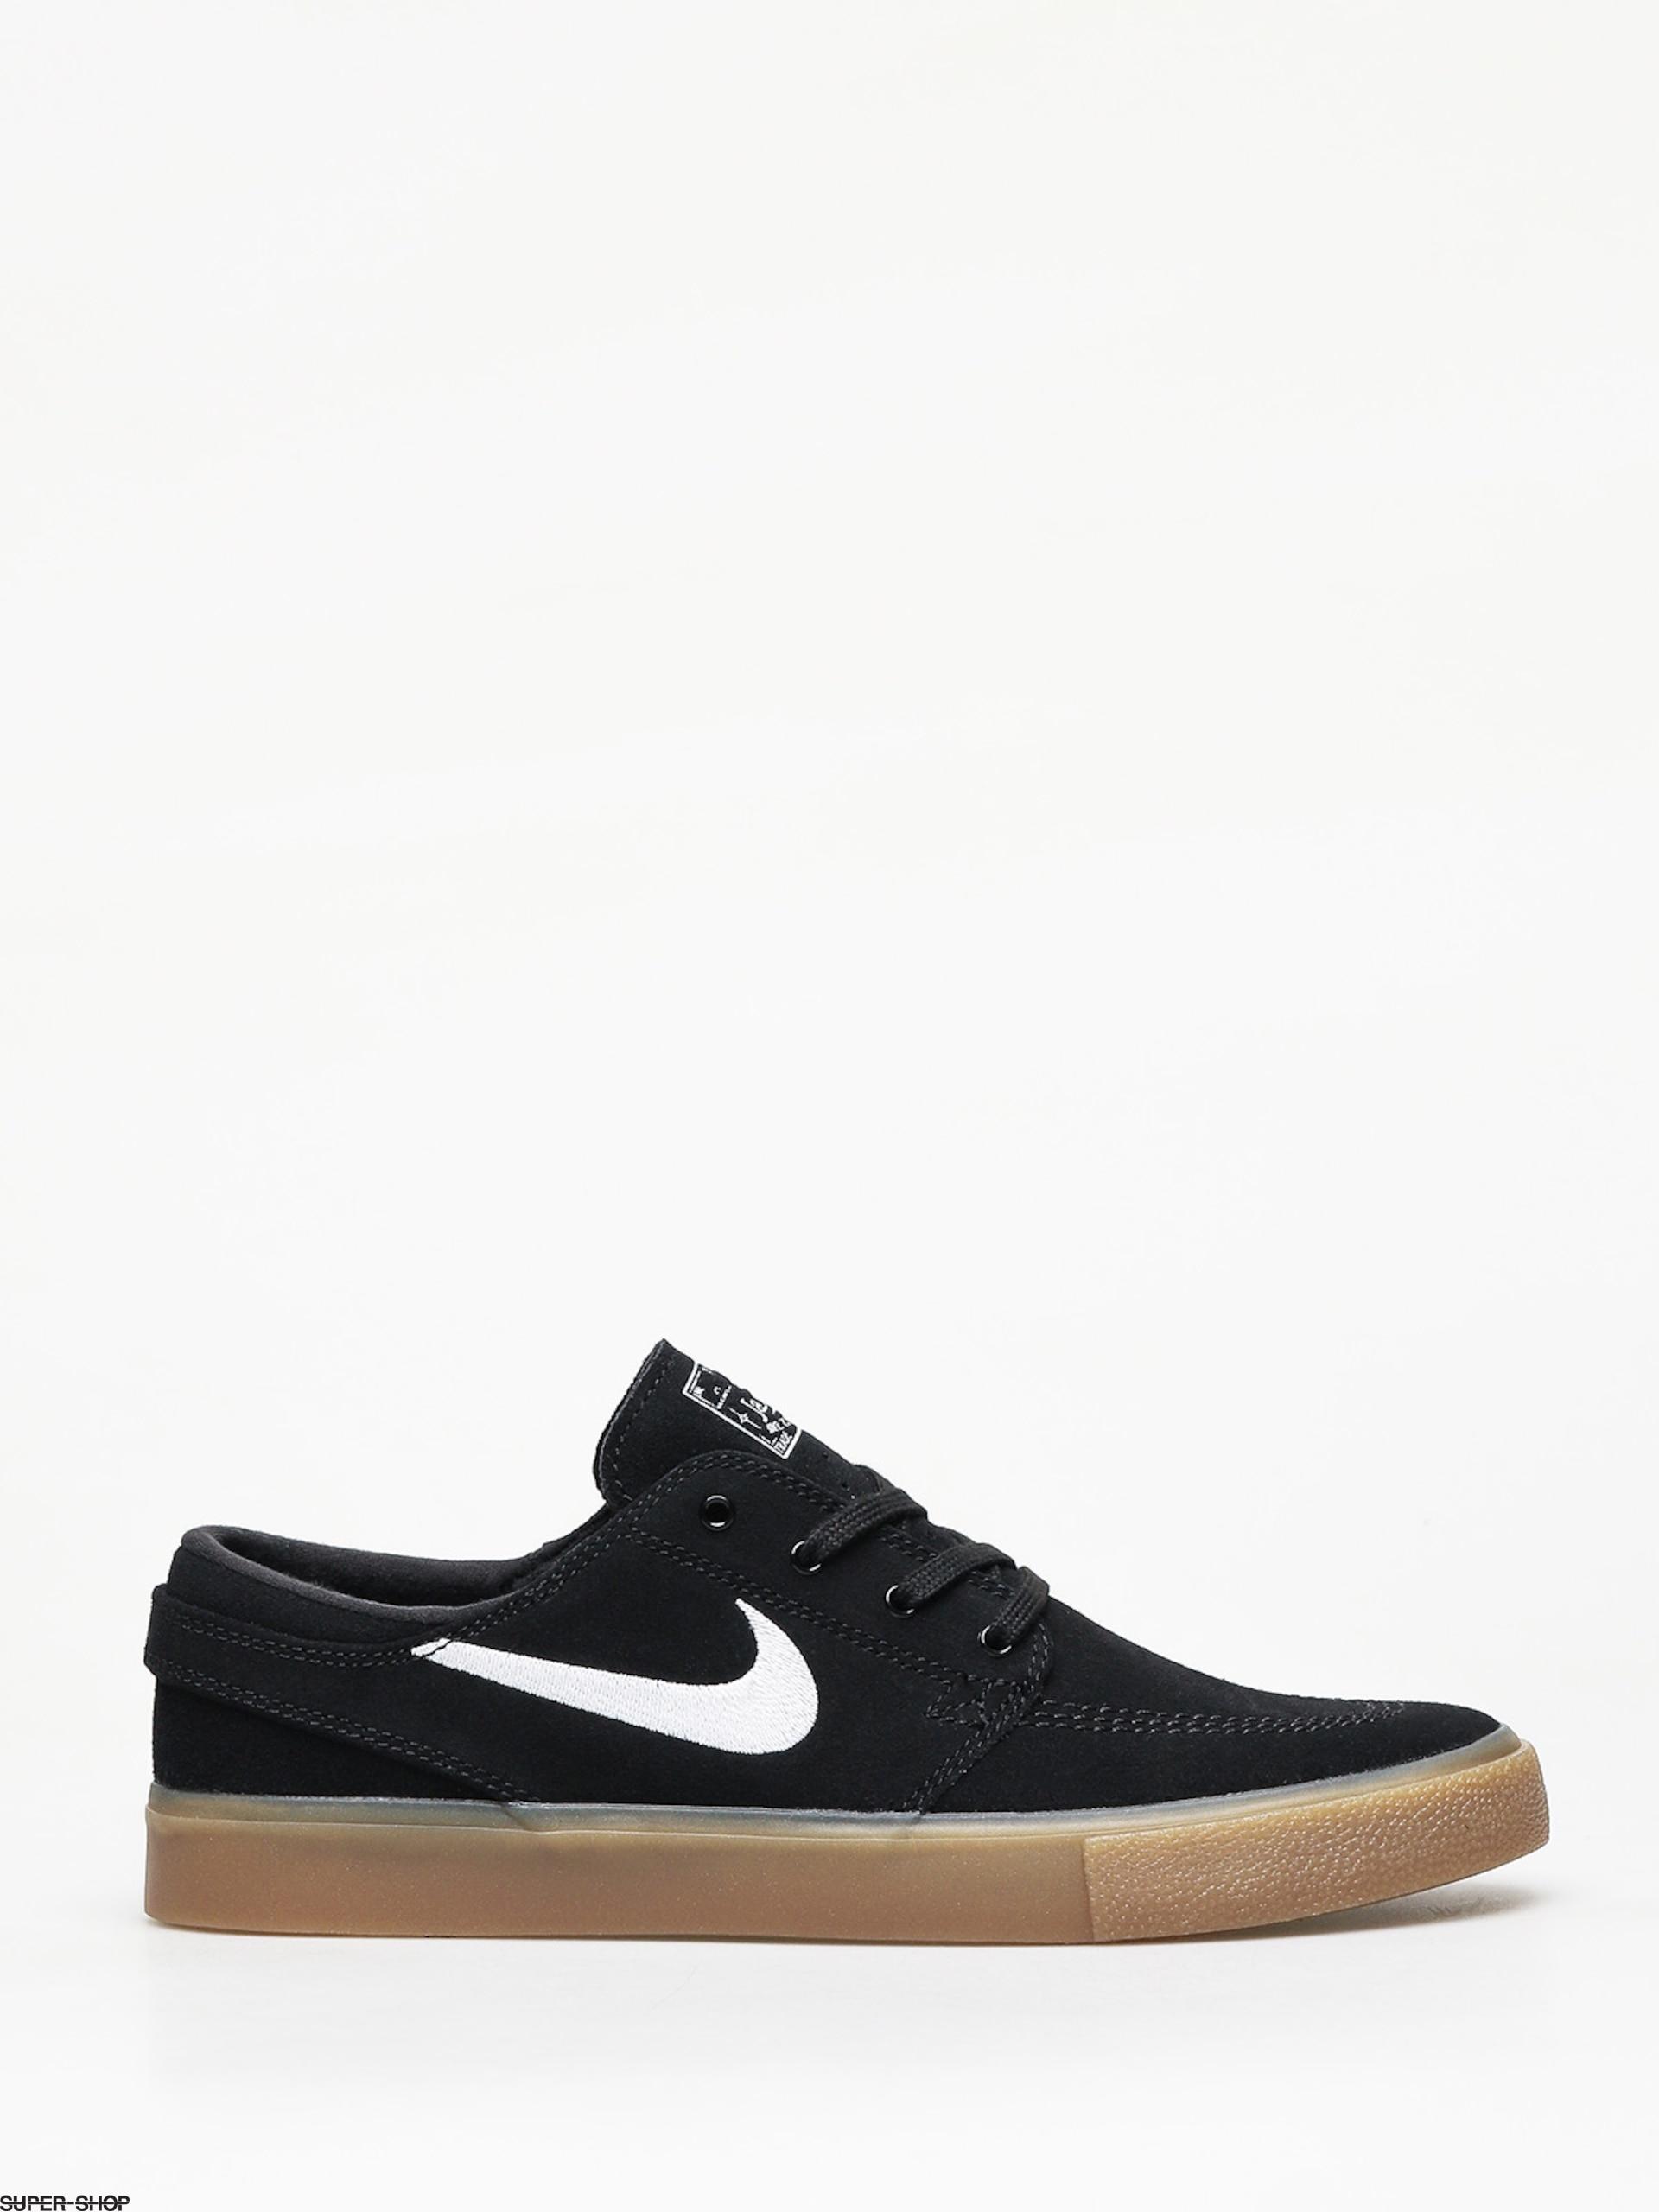 Nike SB Zoom Janoski Rm Shoes (blackwhite black gum light brown)